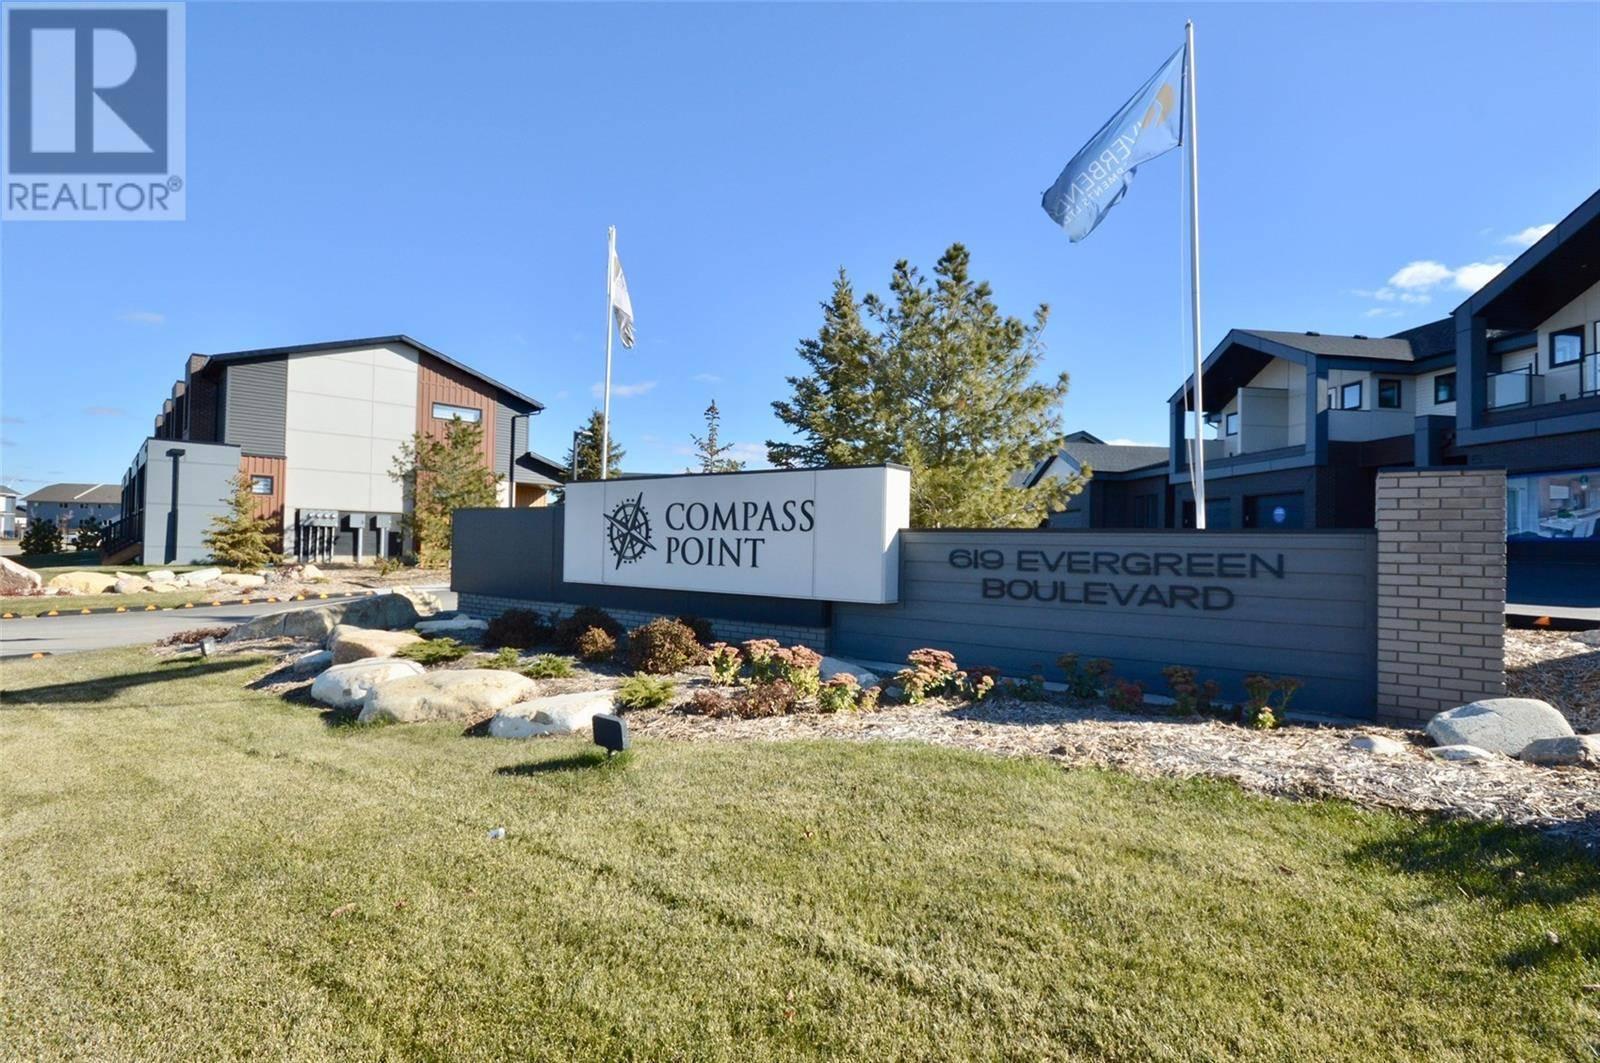 Townhouse for sale at 619 Evergreen Blvd Unit 29 Saskatoon Saskatchewan - MLS: SK793571